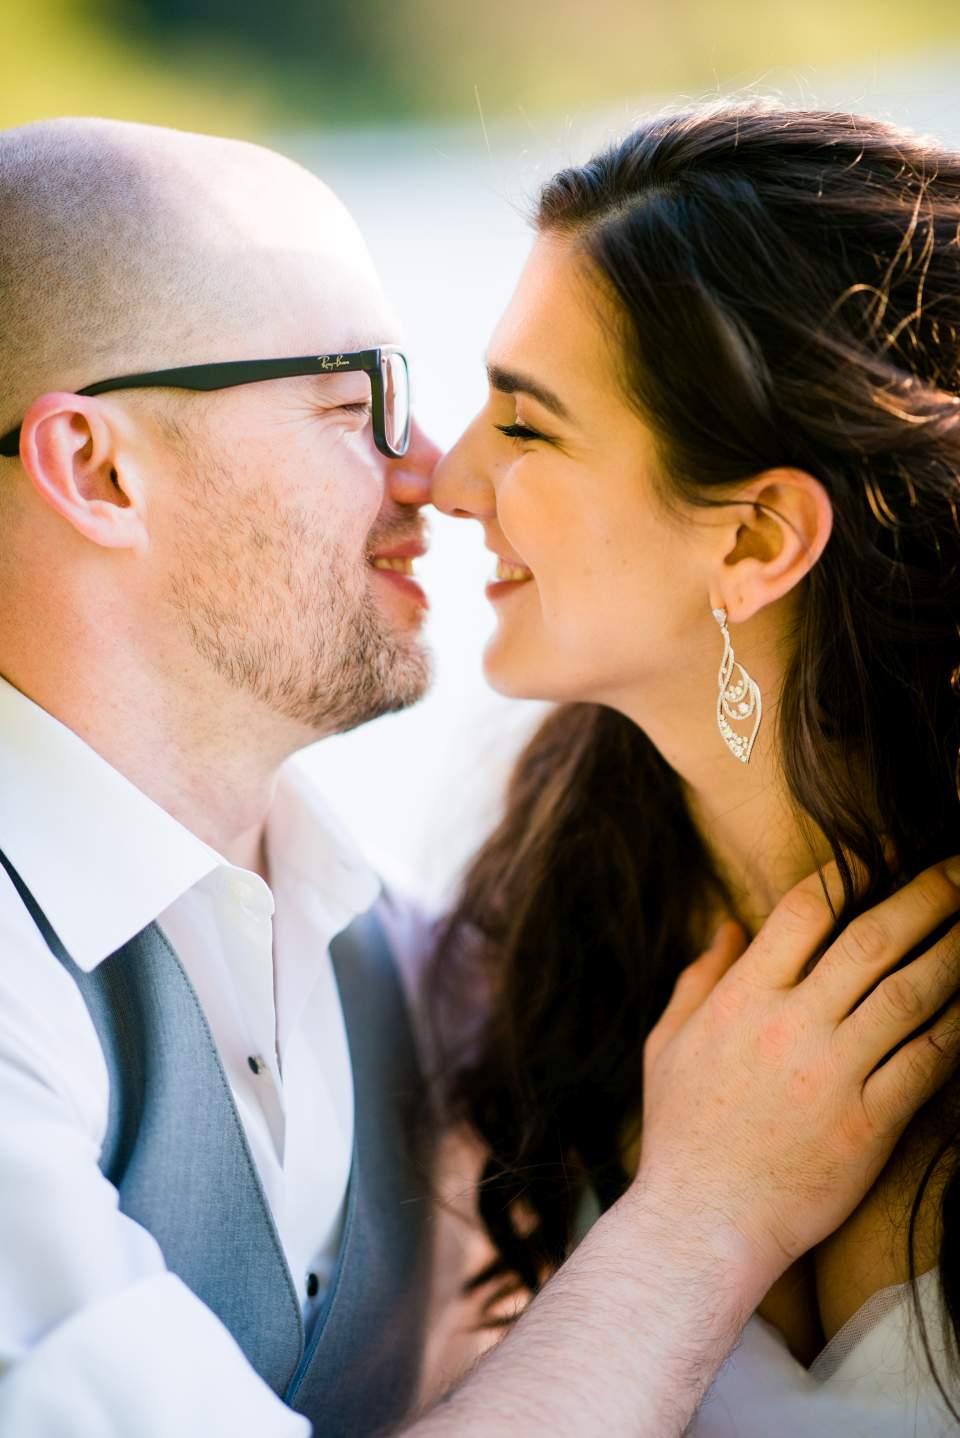 bride and groom ebracing